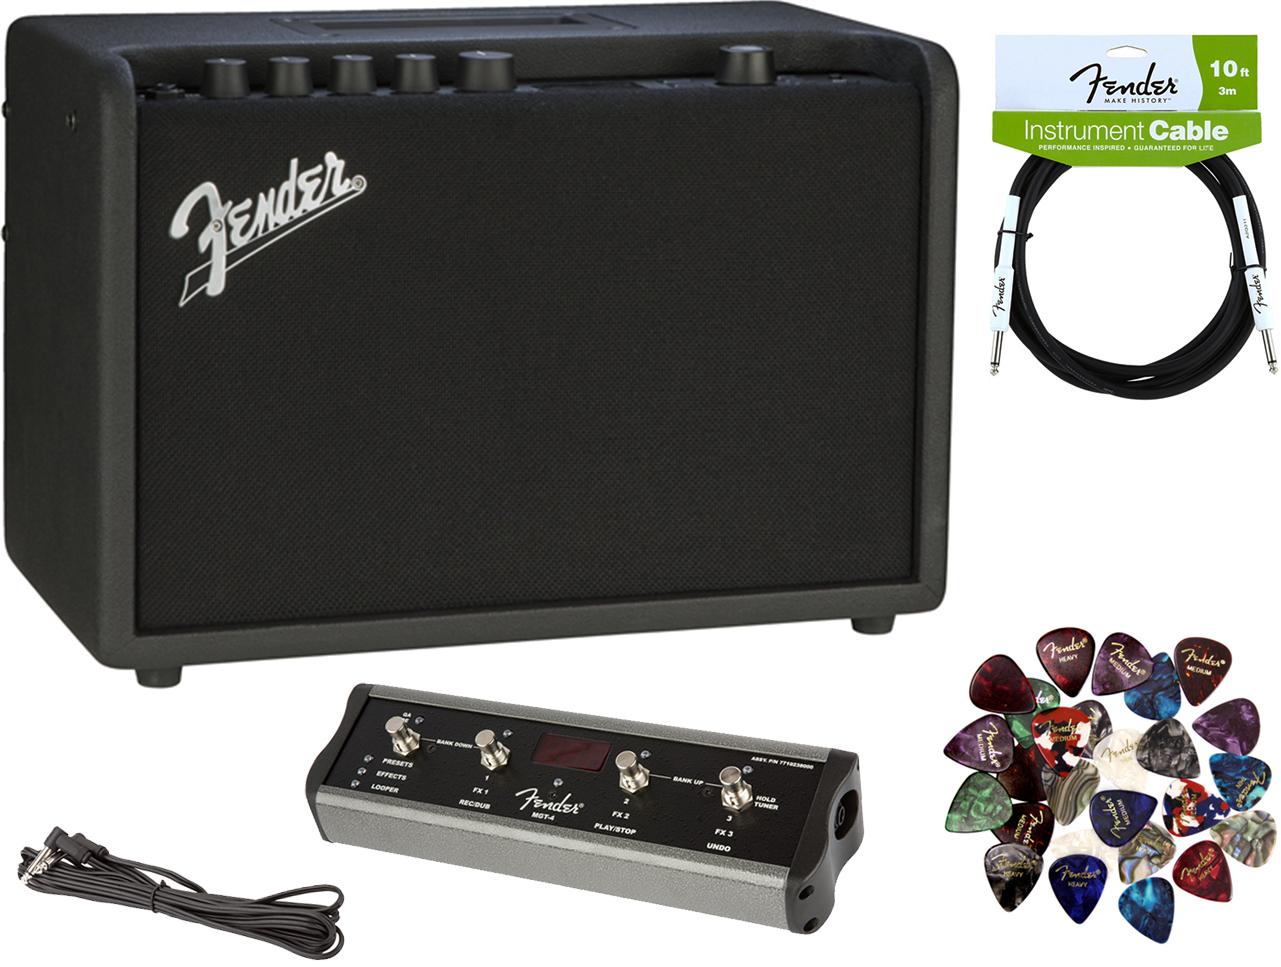 fender mustang gt 40 guitar amplifier w mgt 4 footswitch ebay. Black Bedroom Furniture Sets. Home Design Ideas